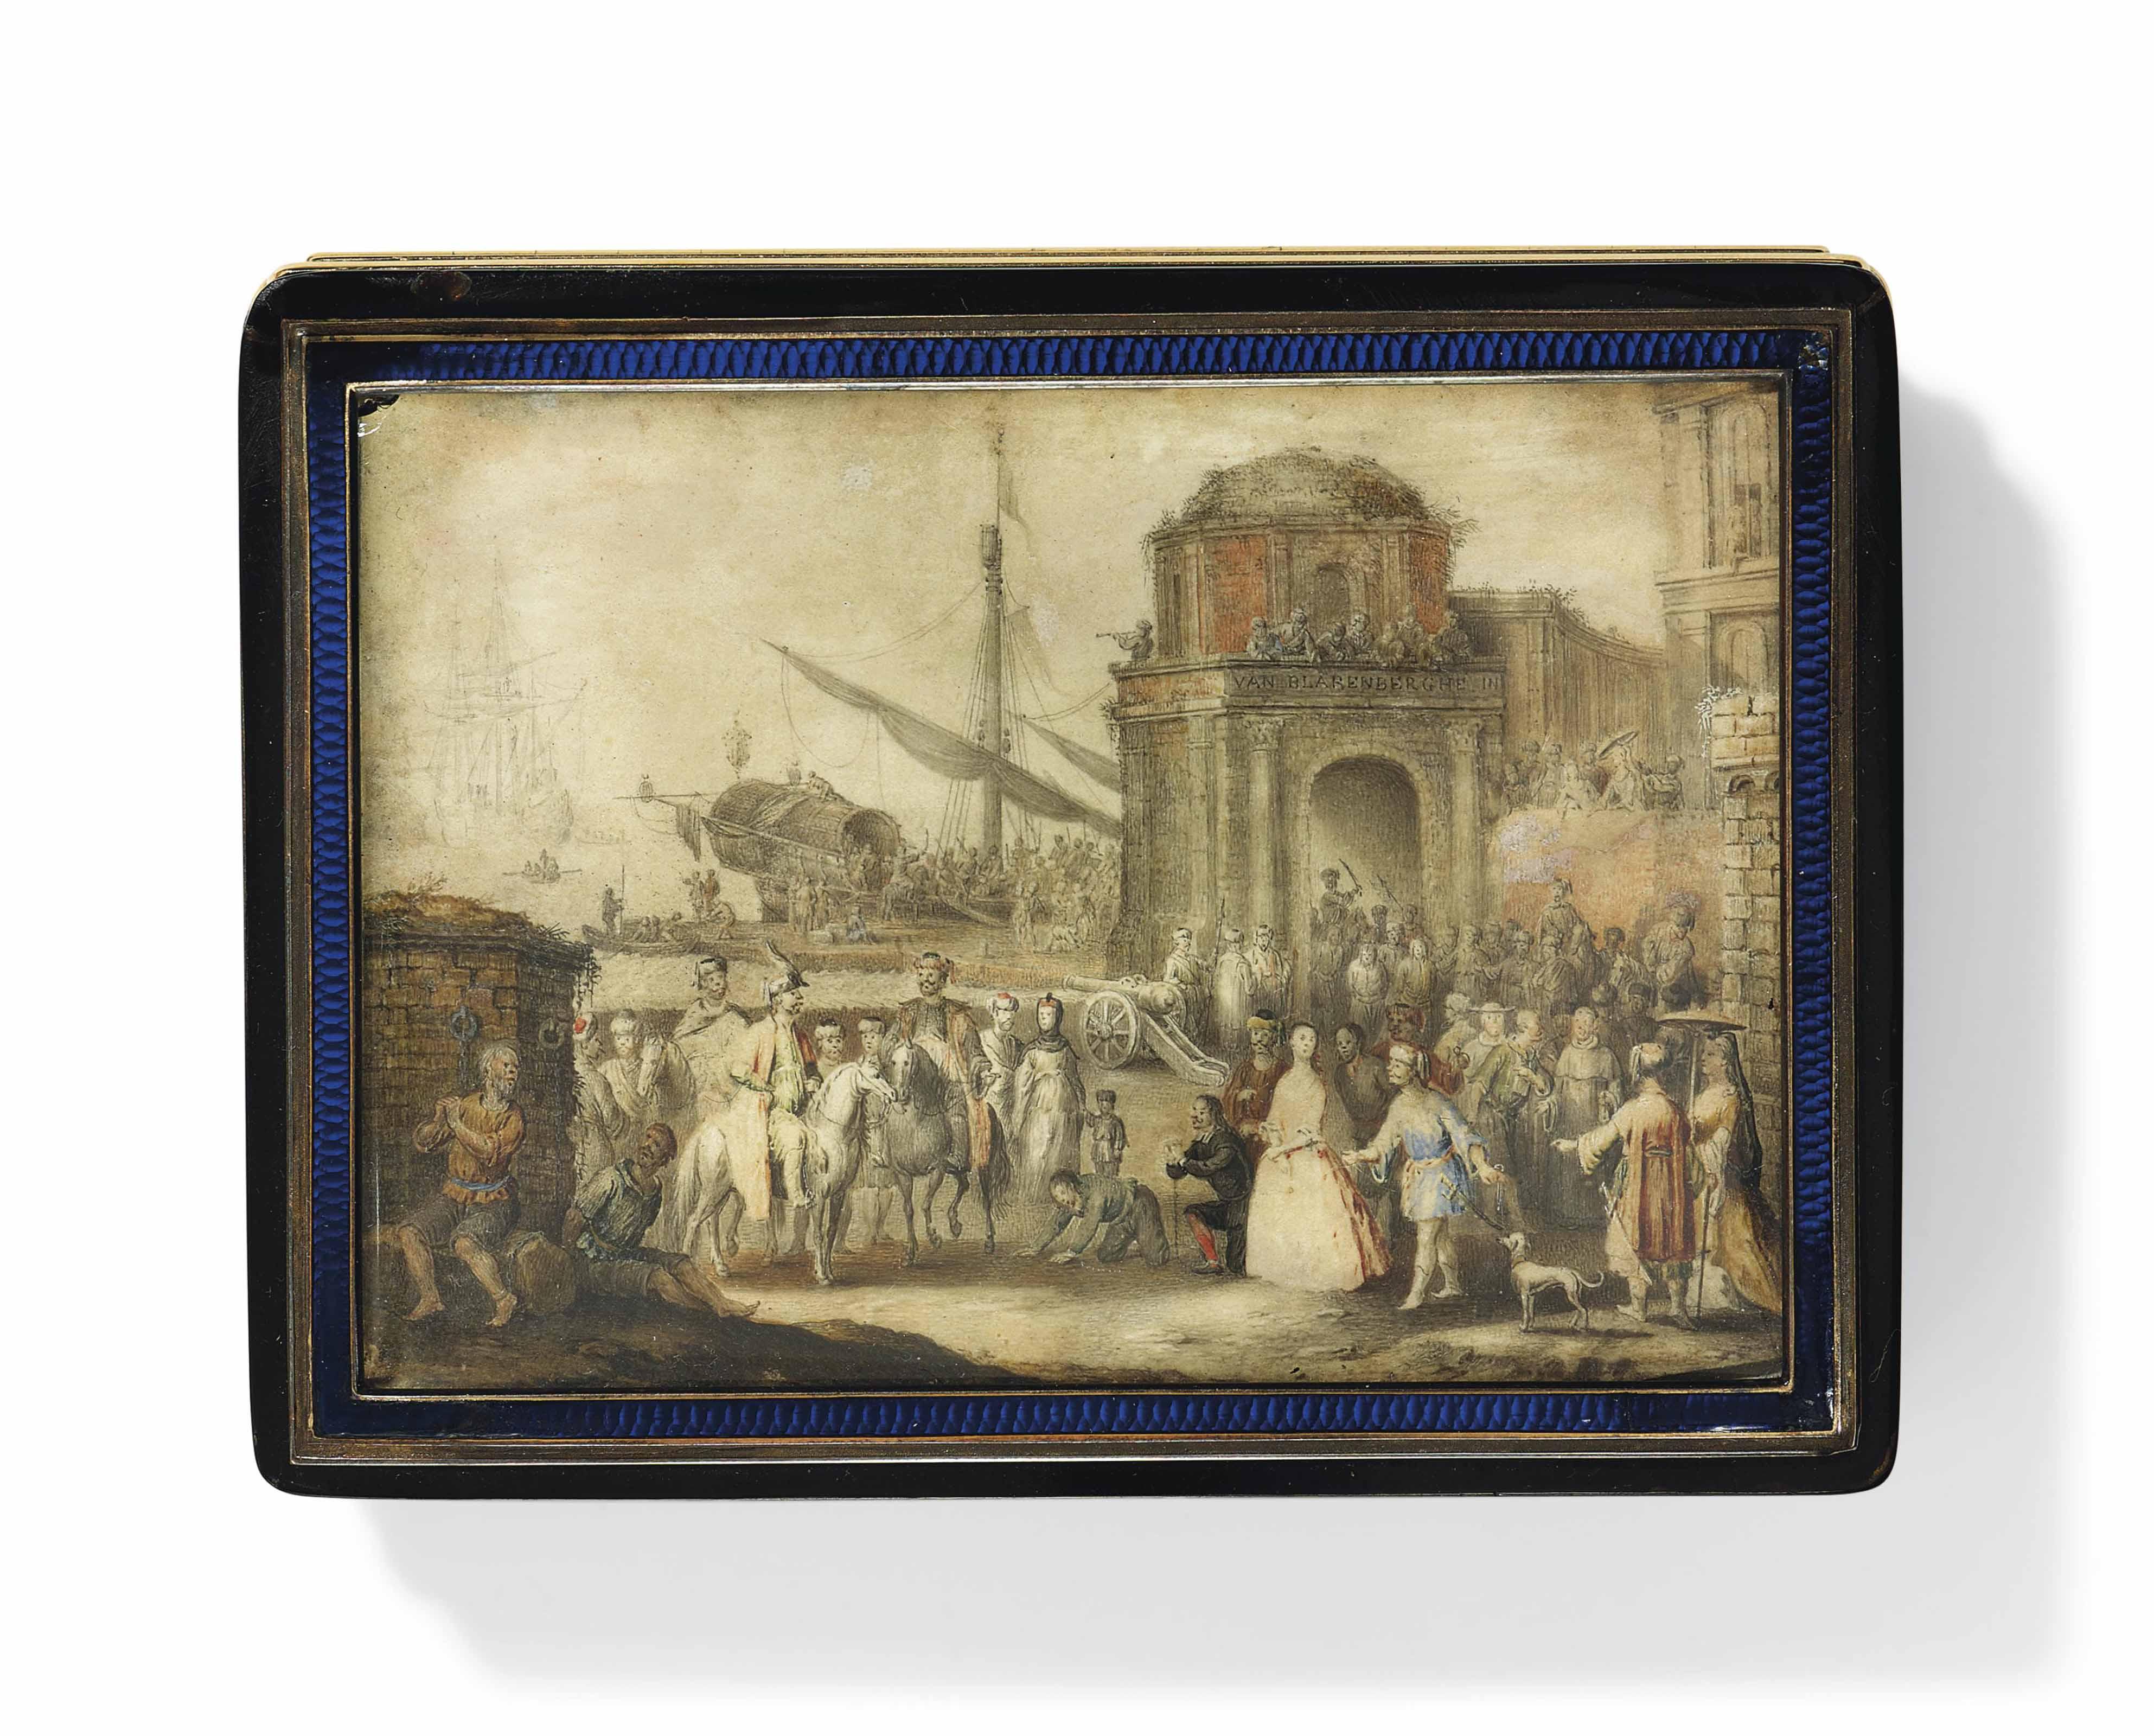 ATTRIBUTED TO LOUIS-NICOLAS VAN BLARENBERGHE (FRENCH, 1716-1794)